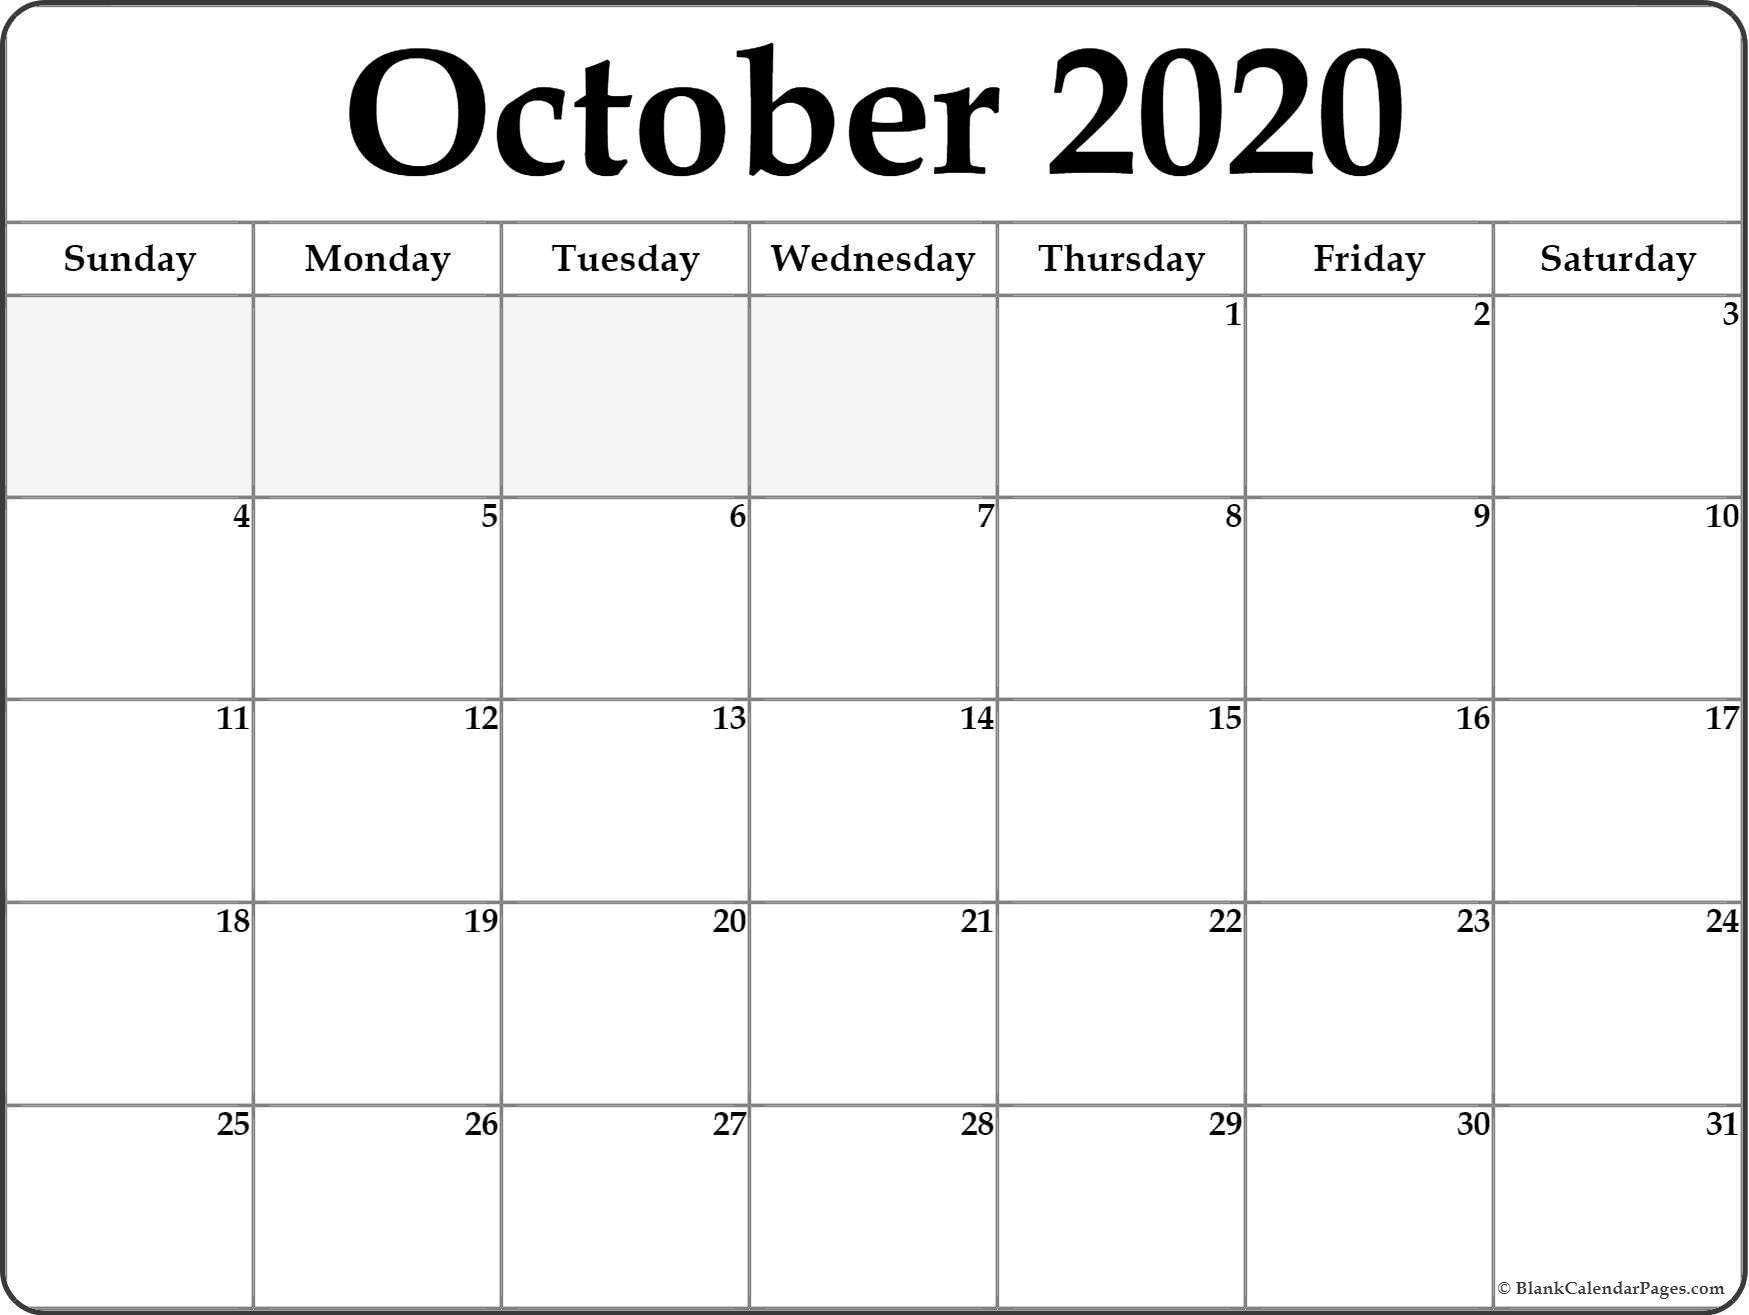 October 2020 Calendar | Free Printable Monthly Calendars-Monthly Bill Calendar 2020